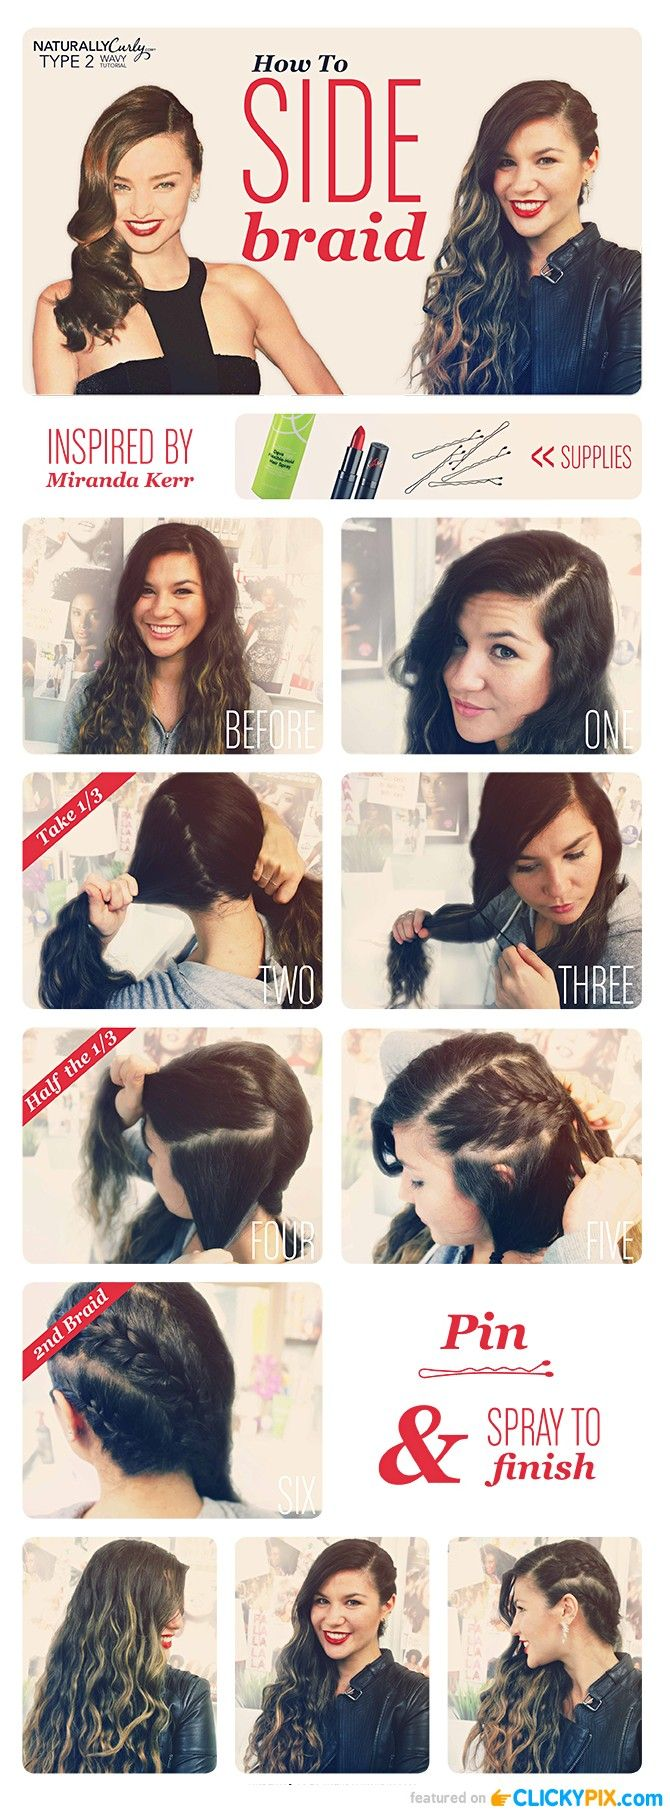 DIY Hair Tutorials Step By Step Guides Hairstyles Pinterest - Undercut hairstyle diy